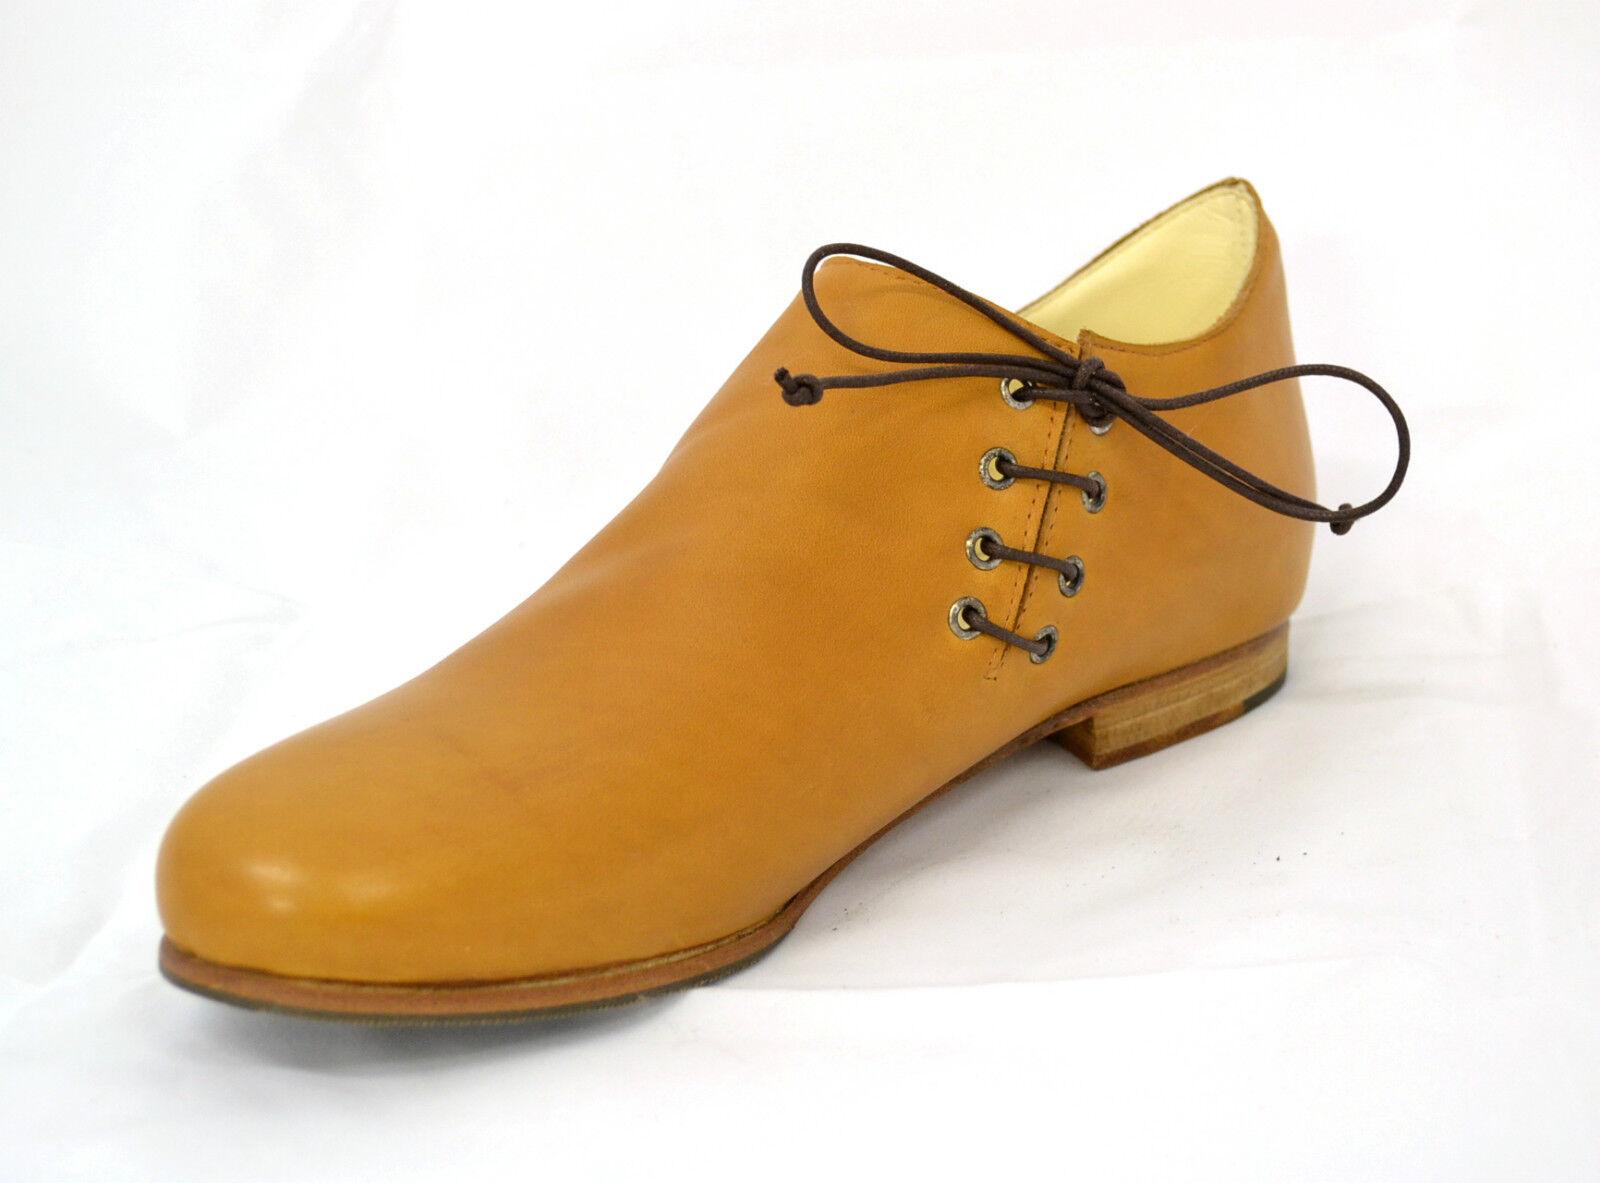 shoes men BAMBINO brown MADE ITALY MEDIO EVO RIEVOCAZIONI STORICHE COSPLAY